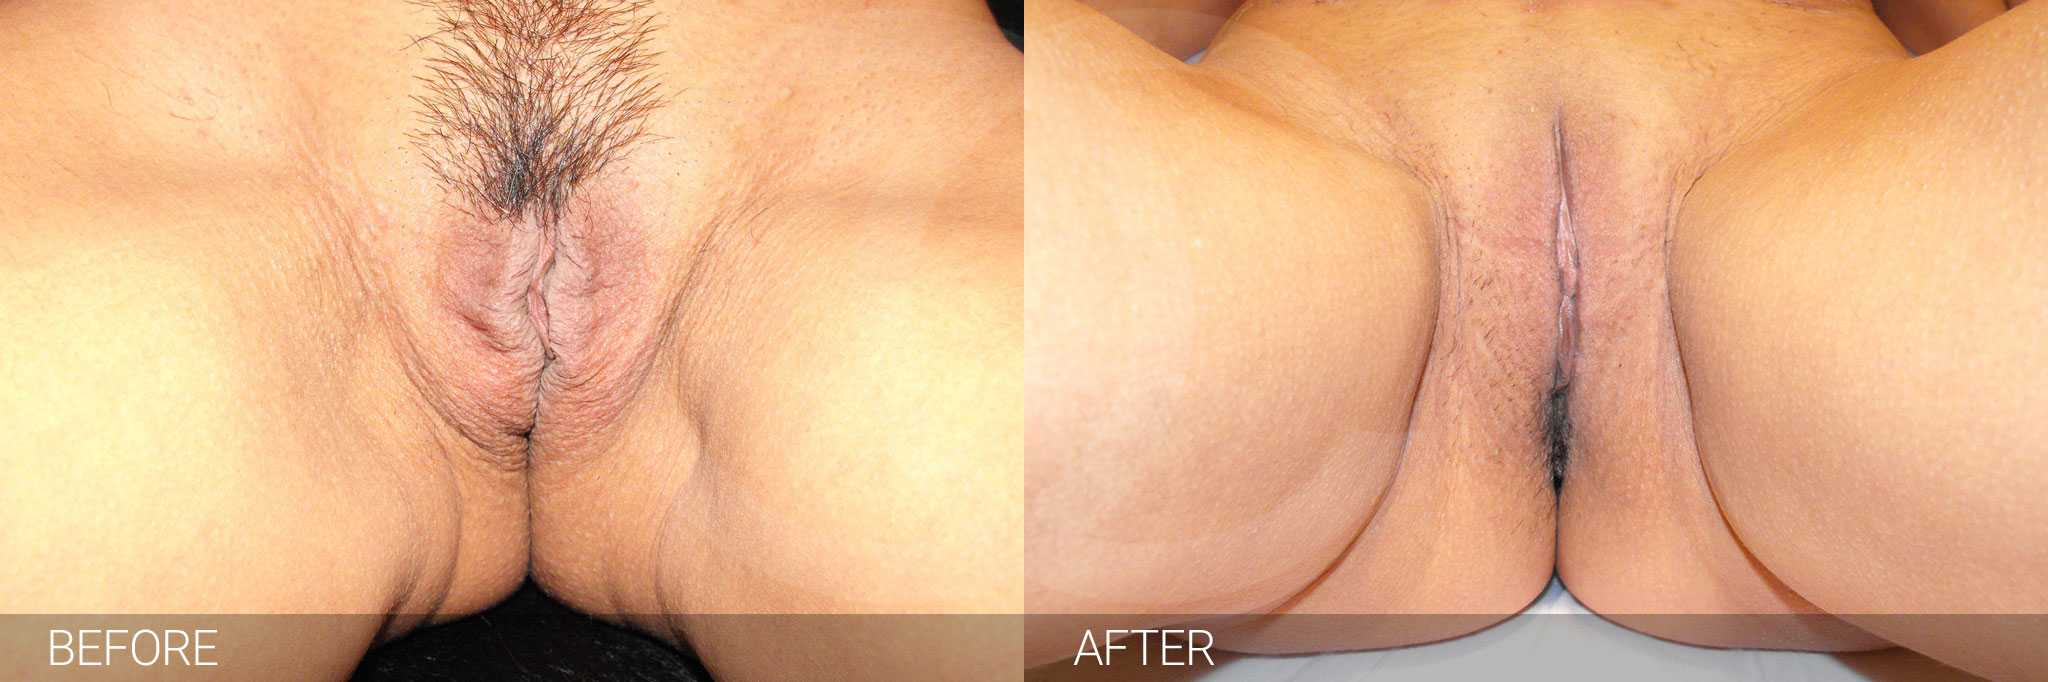 Labiaplasty Inner labia reduction ante/post-op I